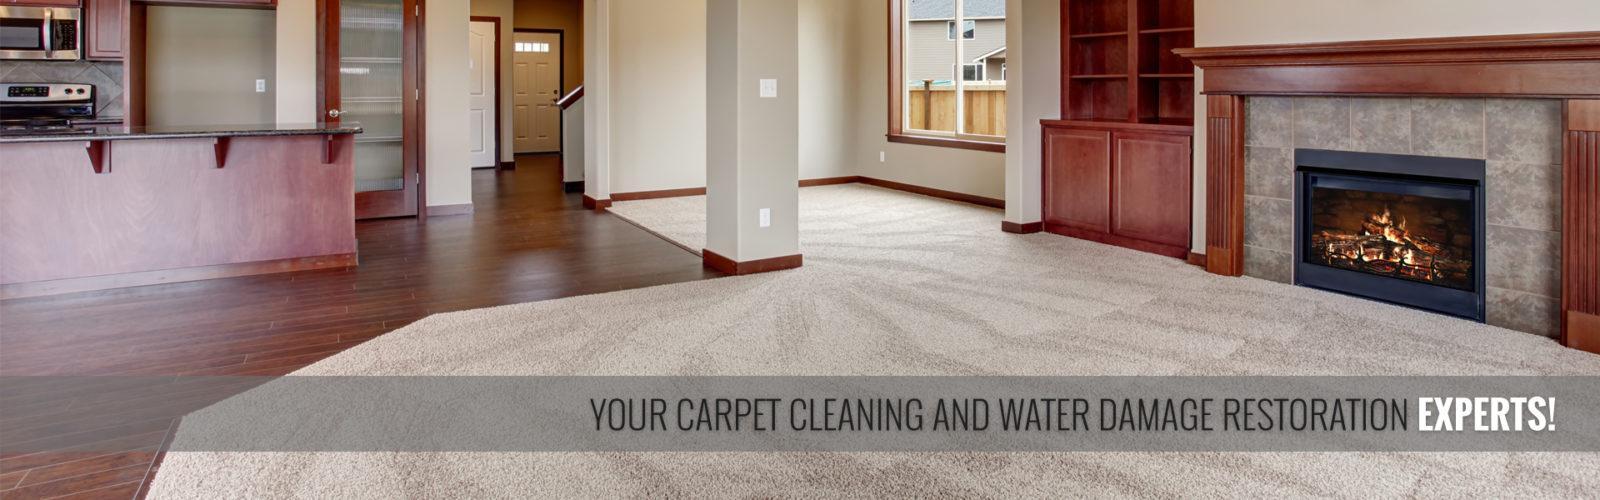 Tim's Carpet Cleaning